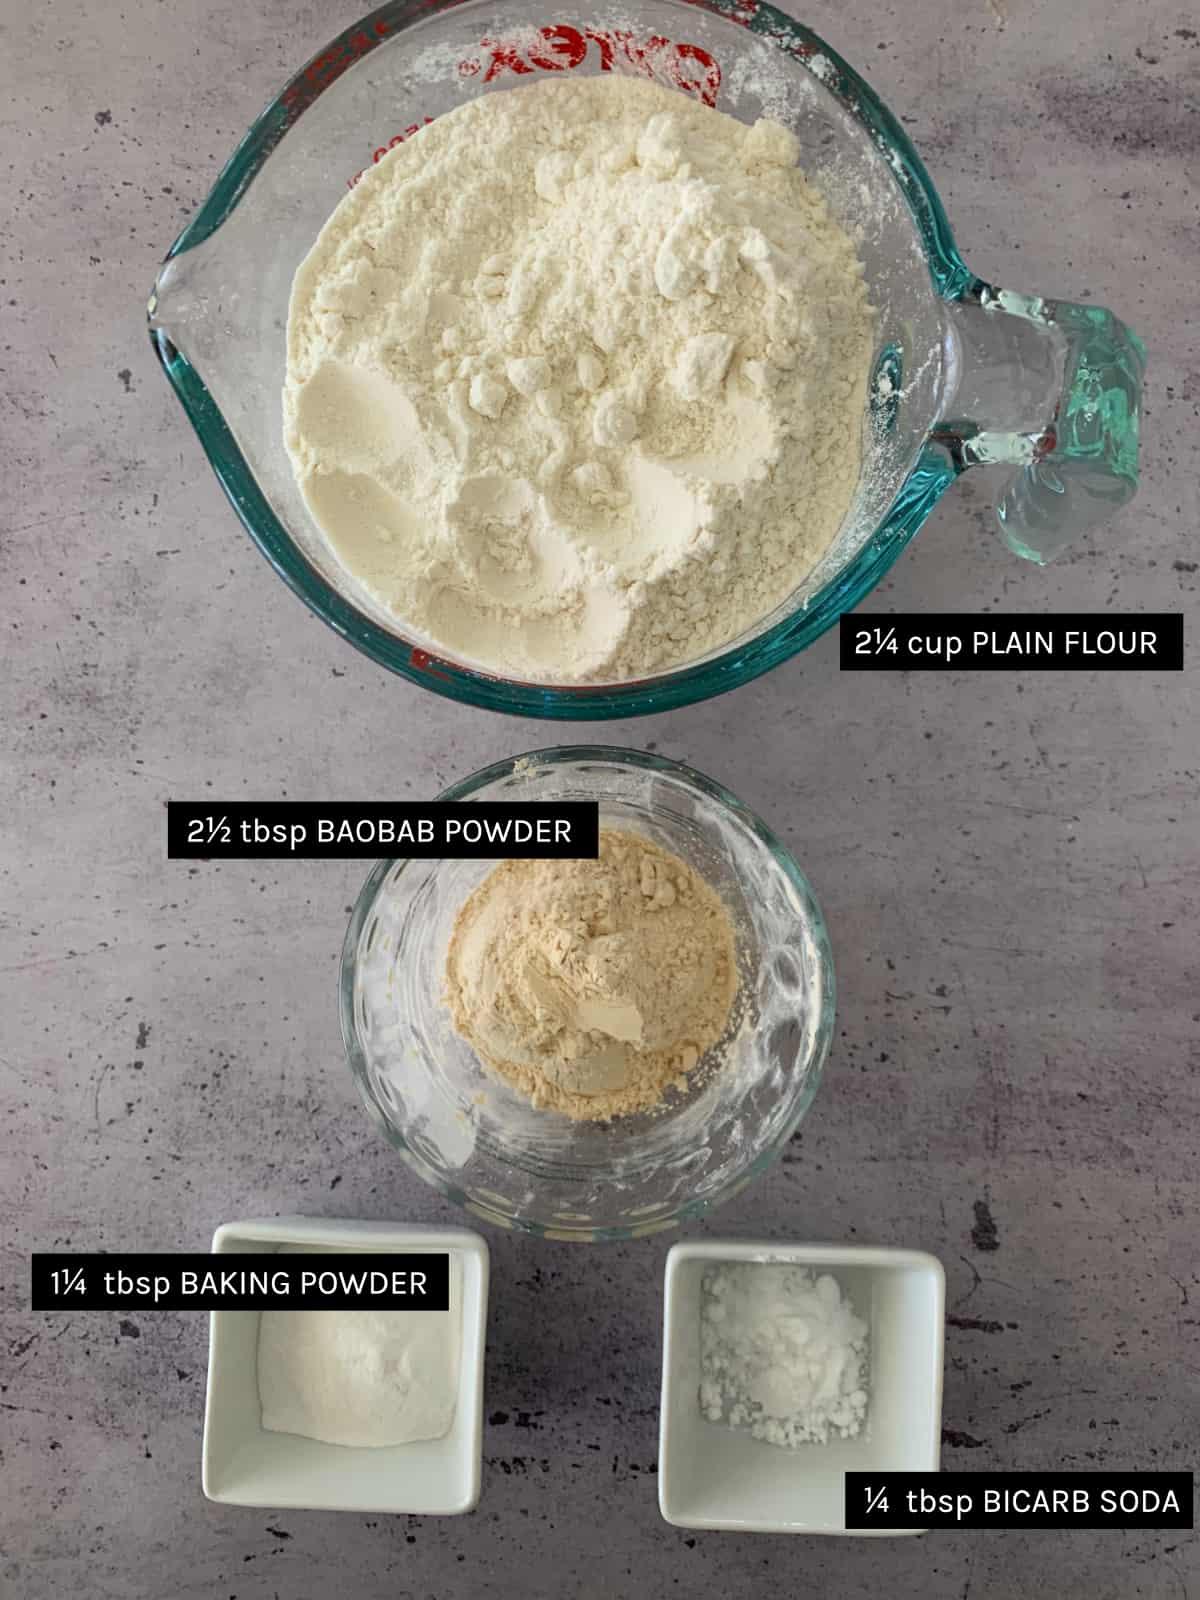 Baobab Muffin dry ingredients list